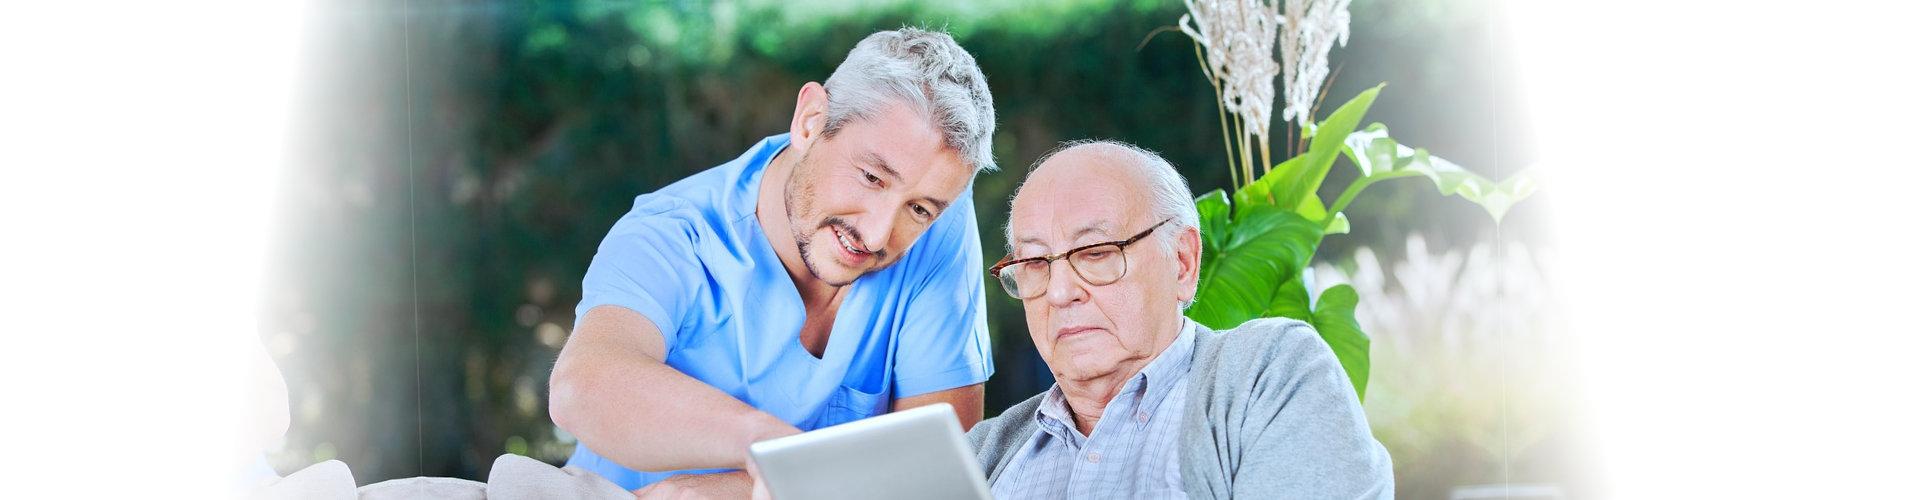 senior man and caregiver using a tablet